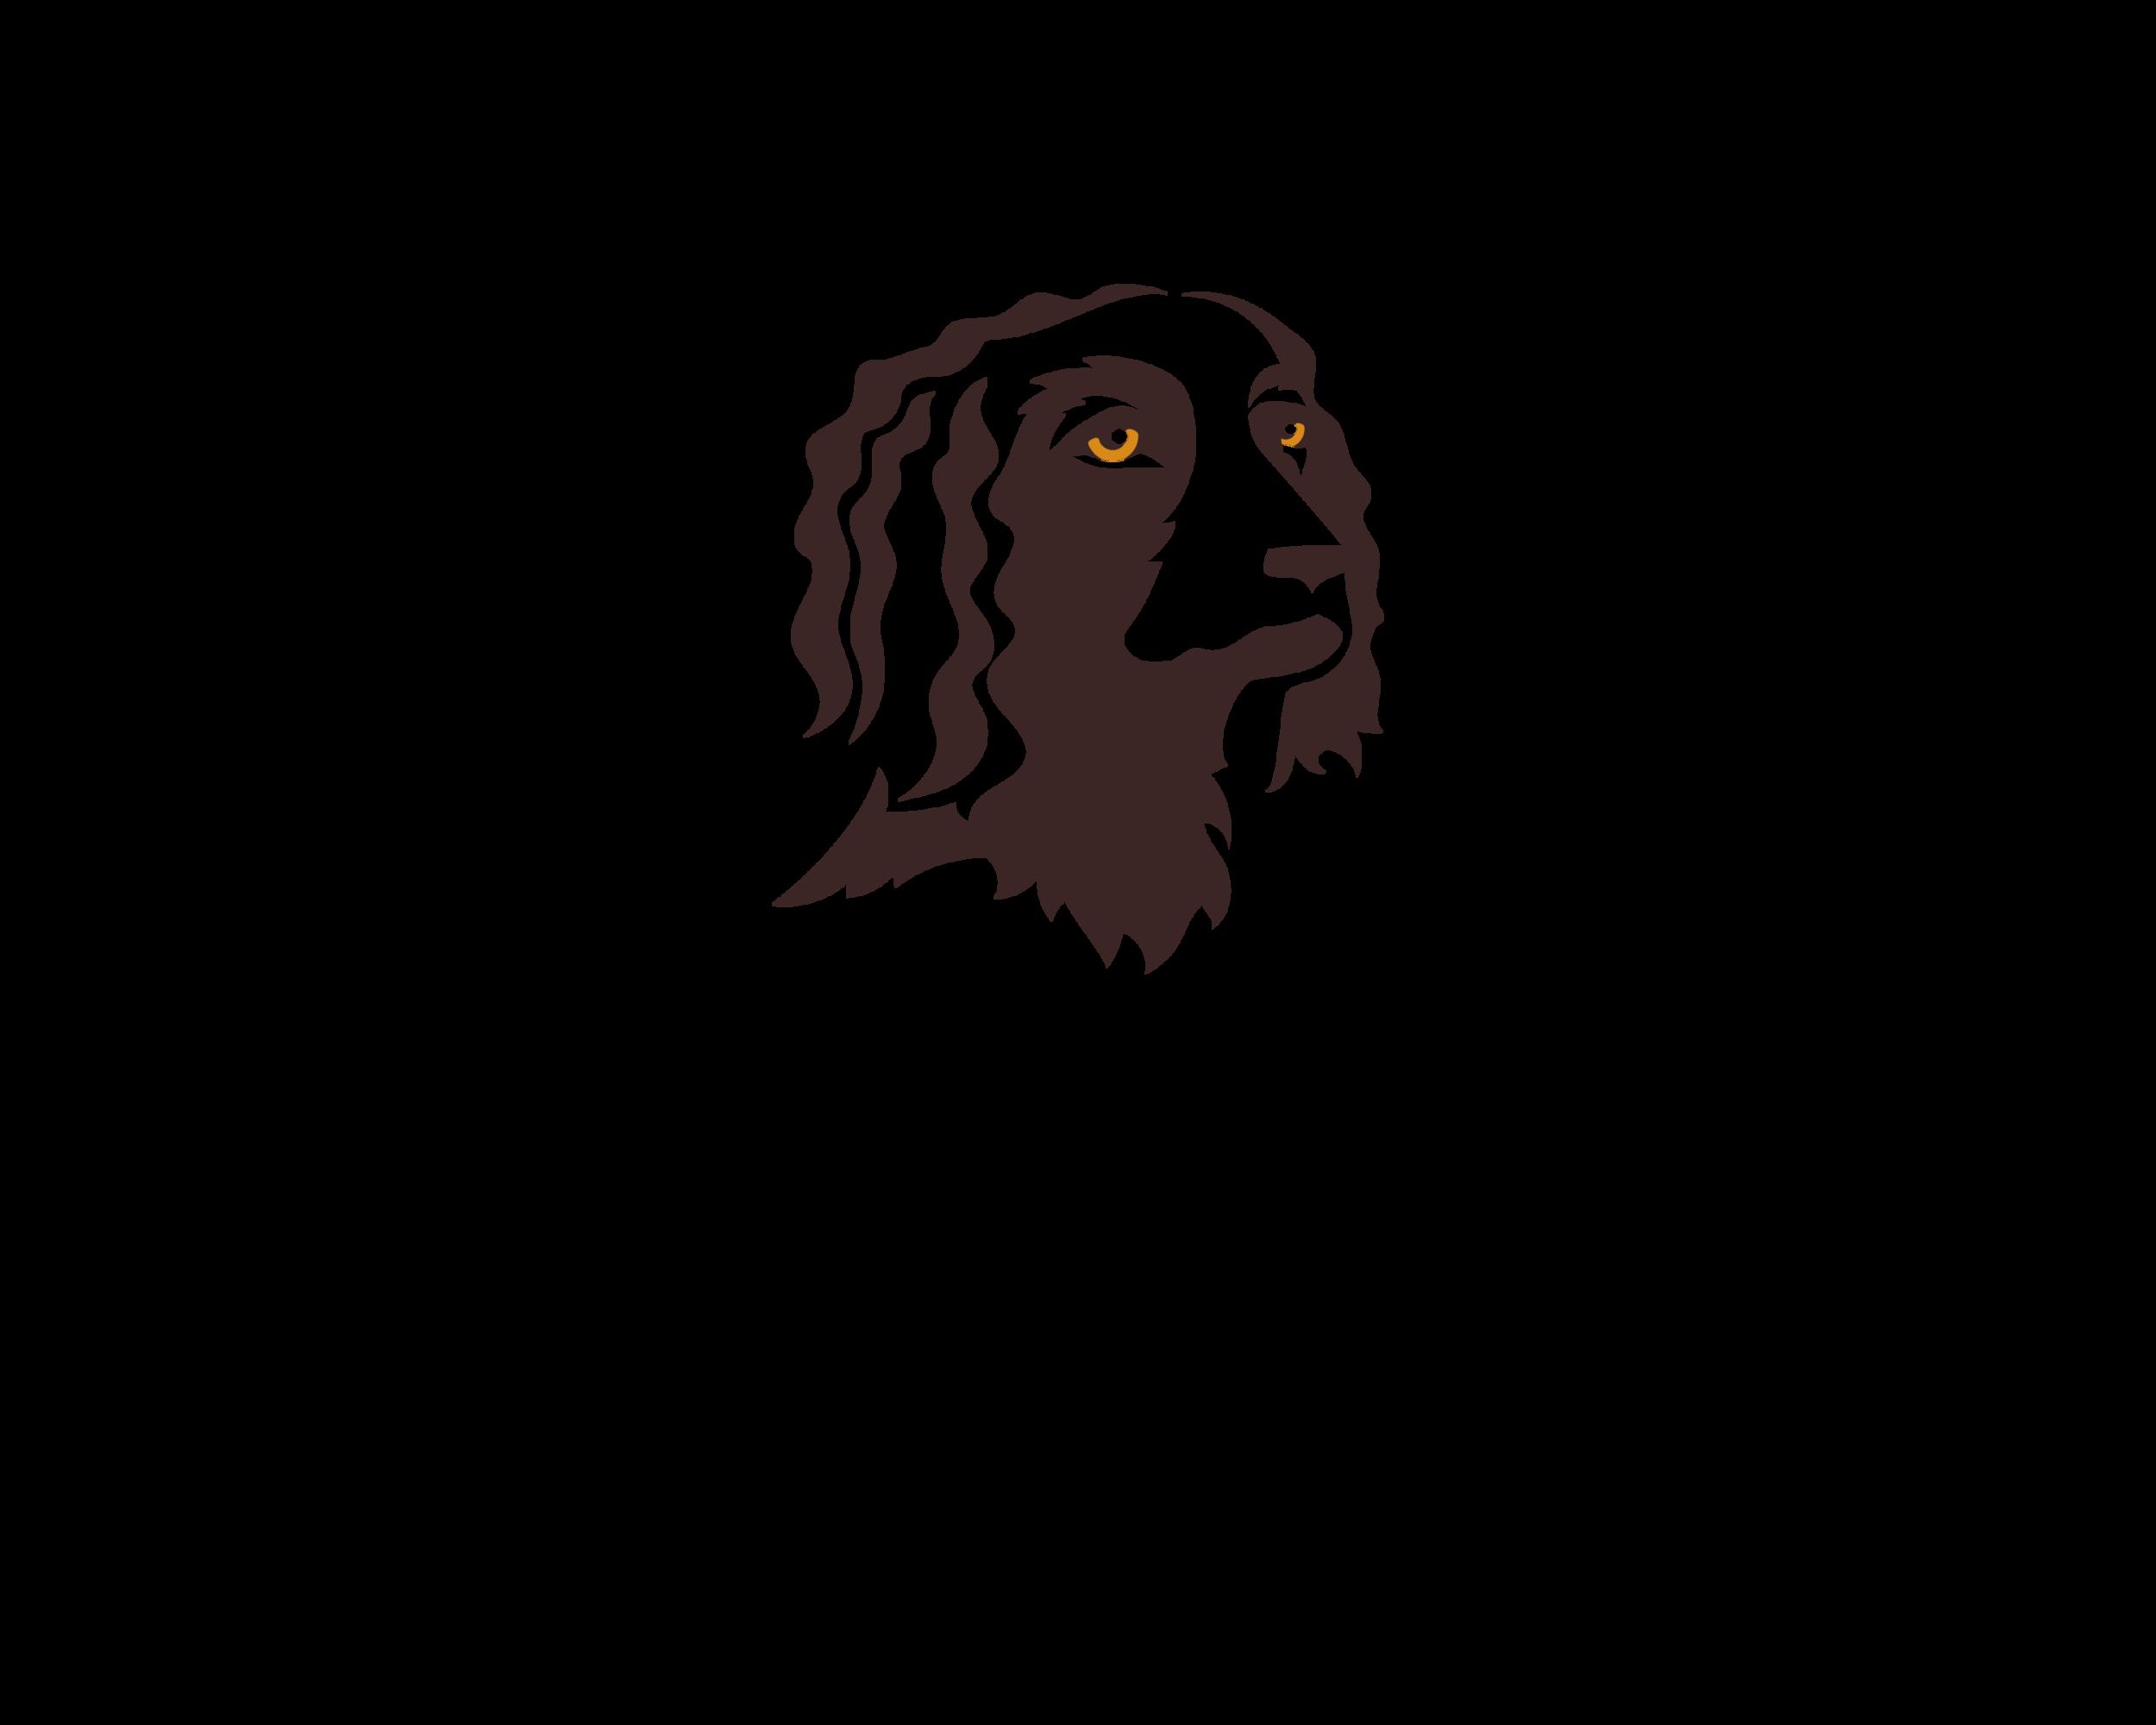 logo_ValleyWayKennels-2017-11-30_01.png